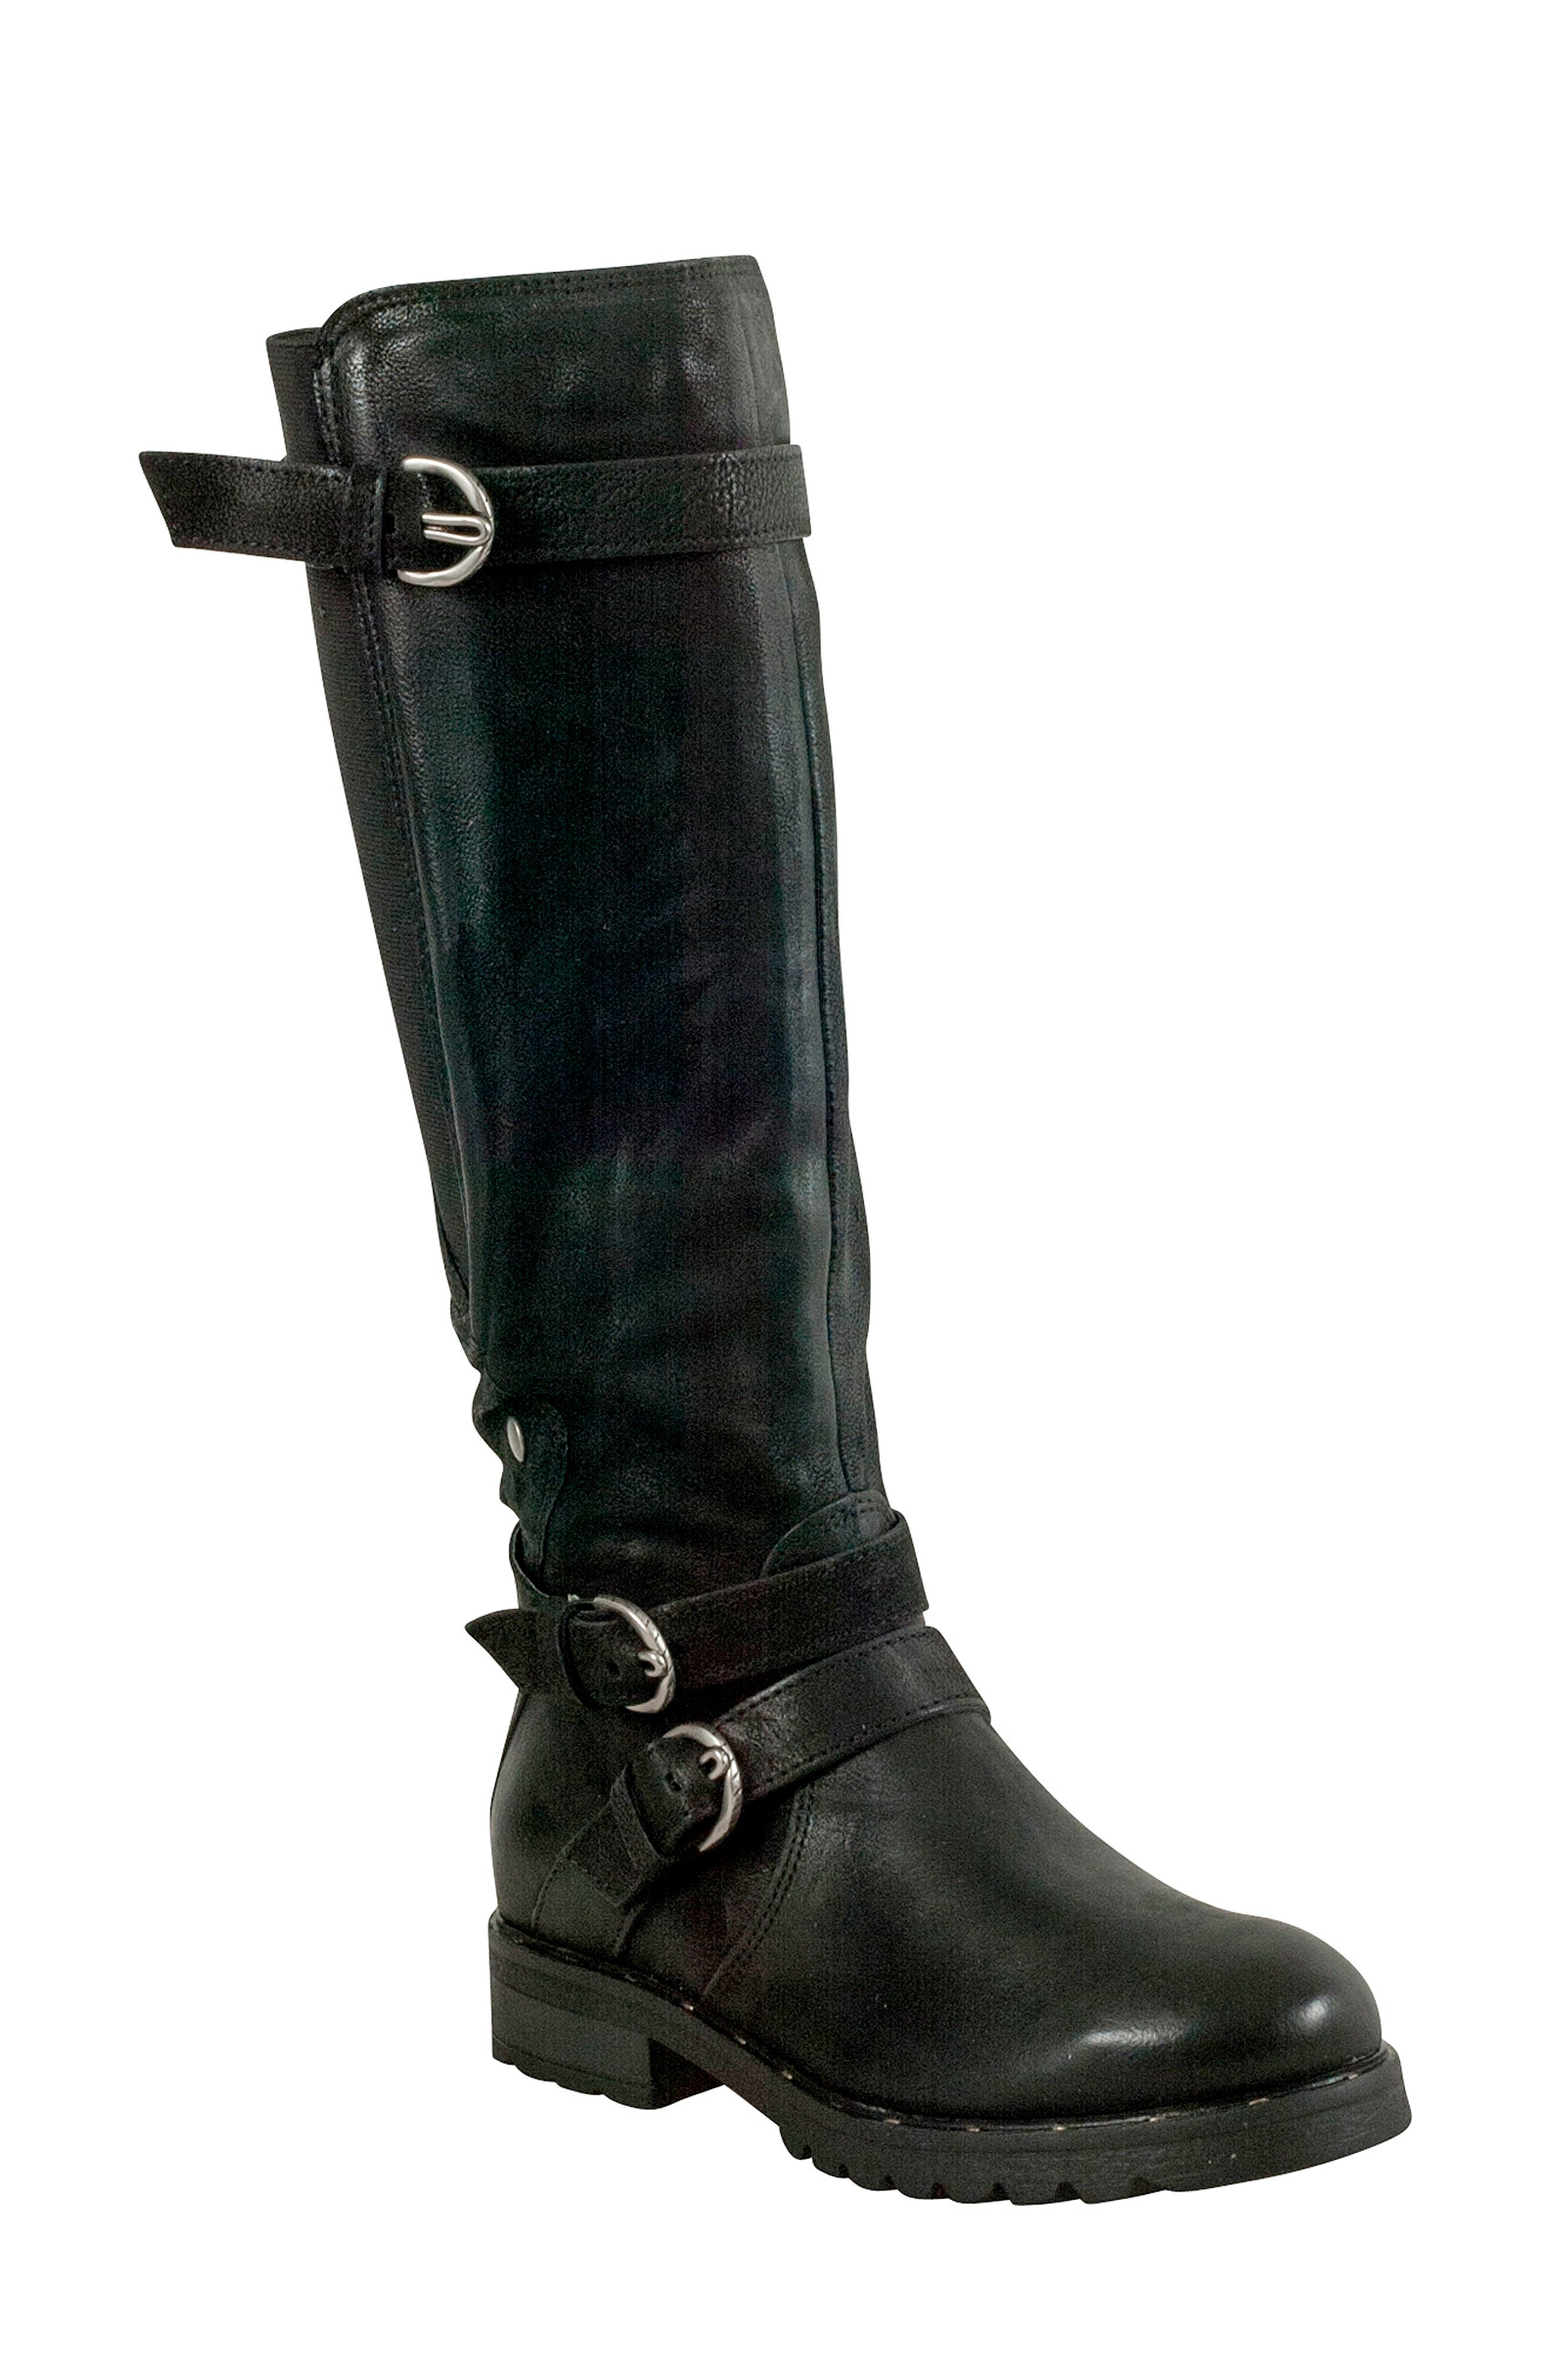 Miz Mooz Prim Knee High Boot